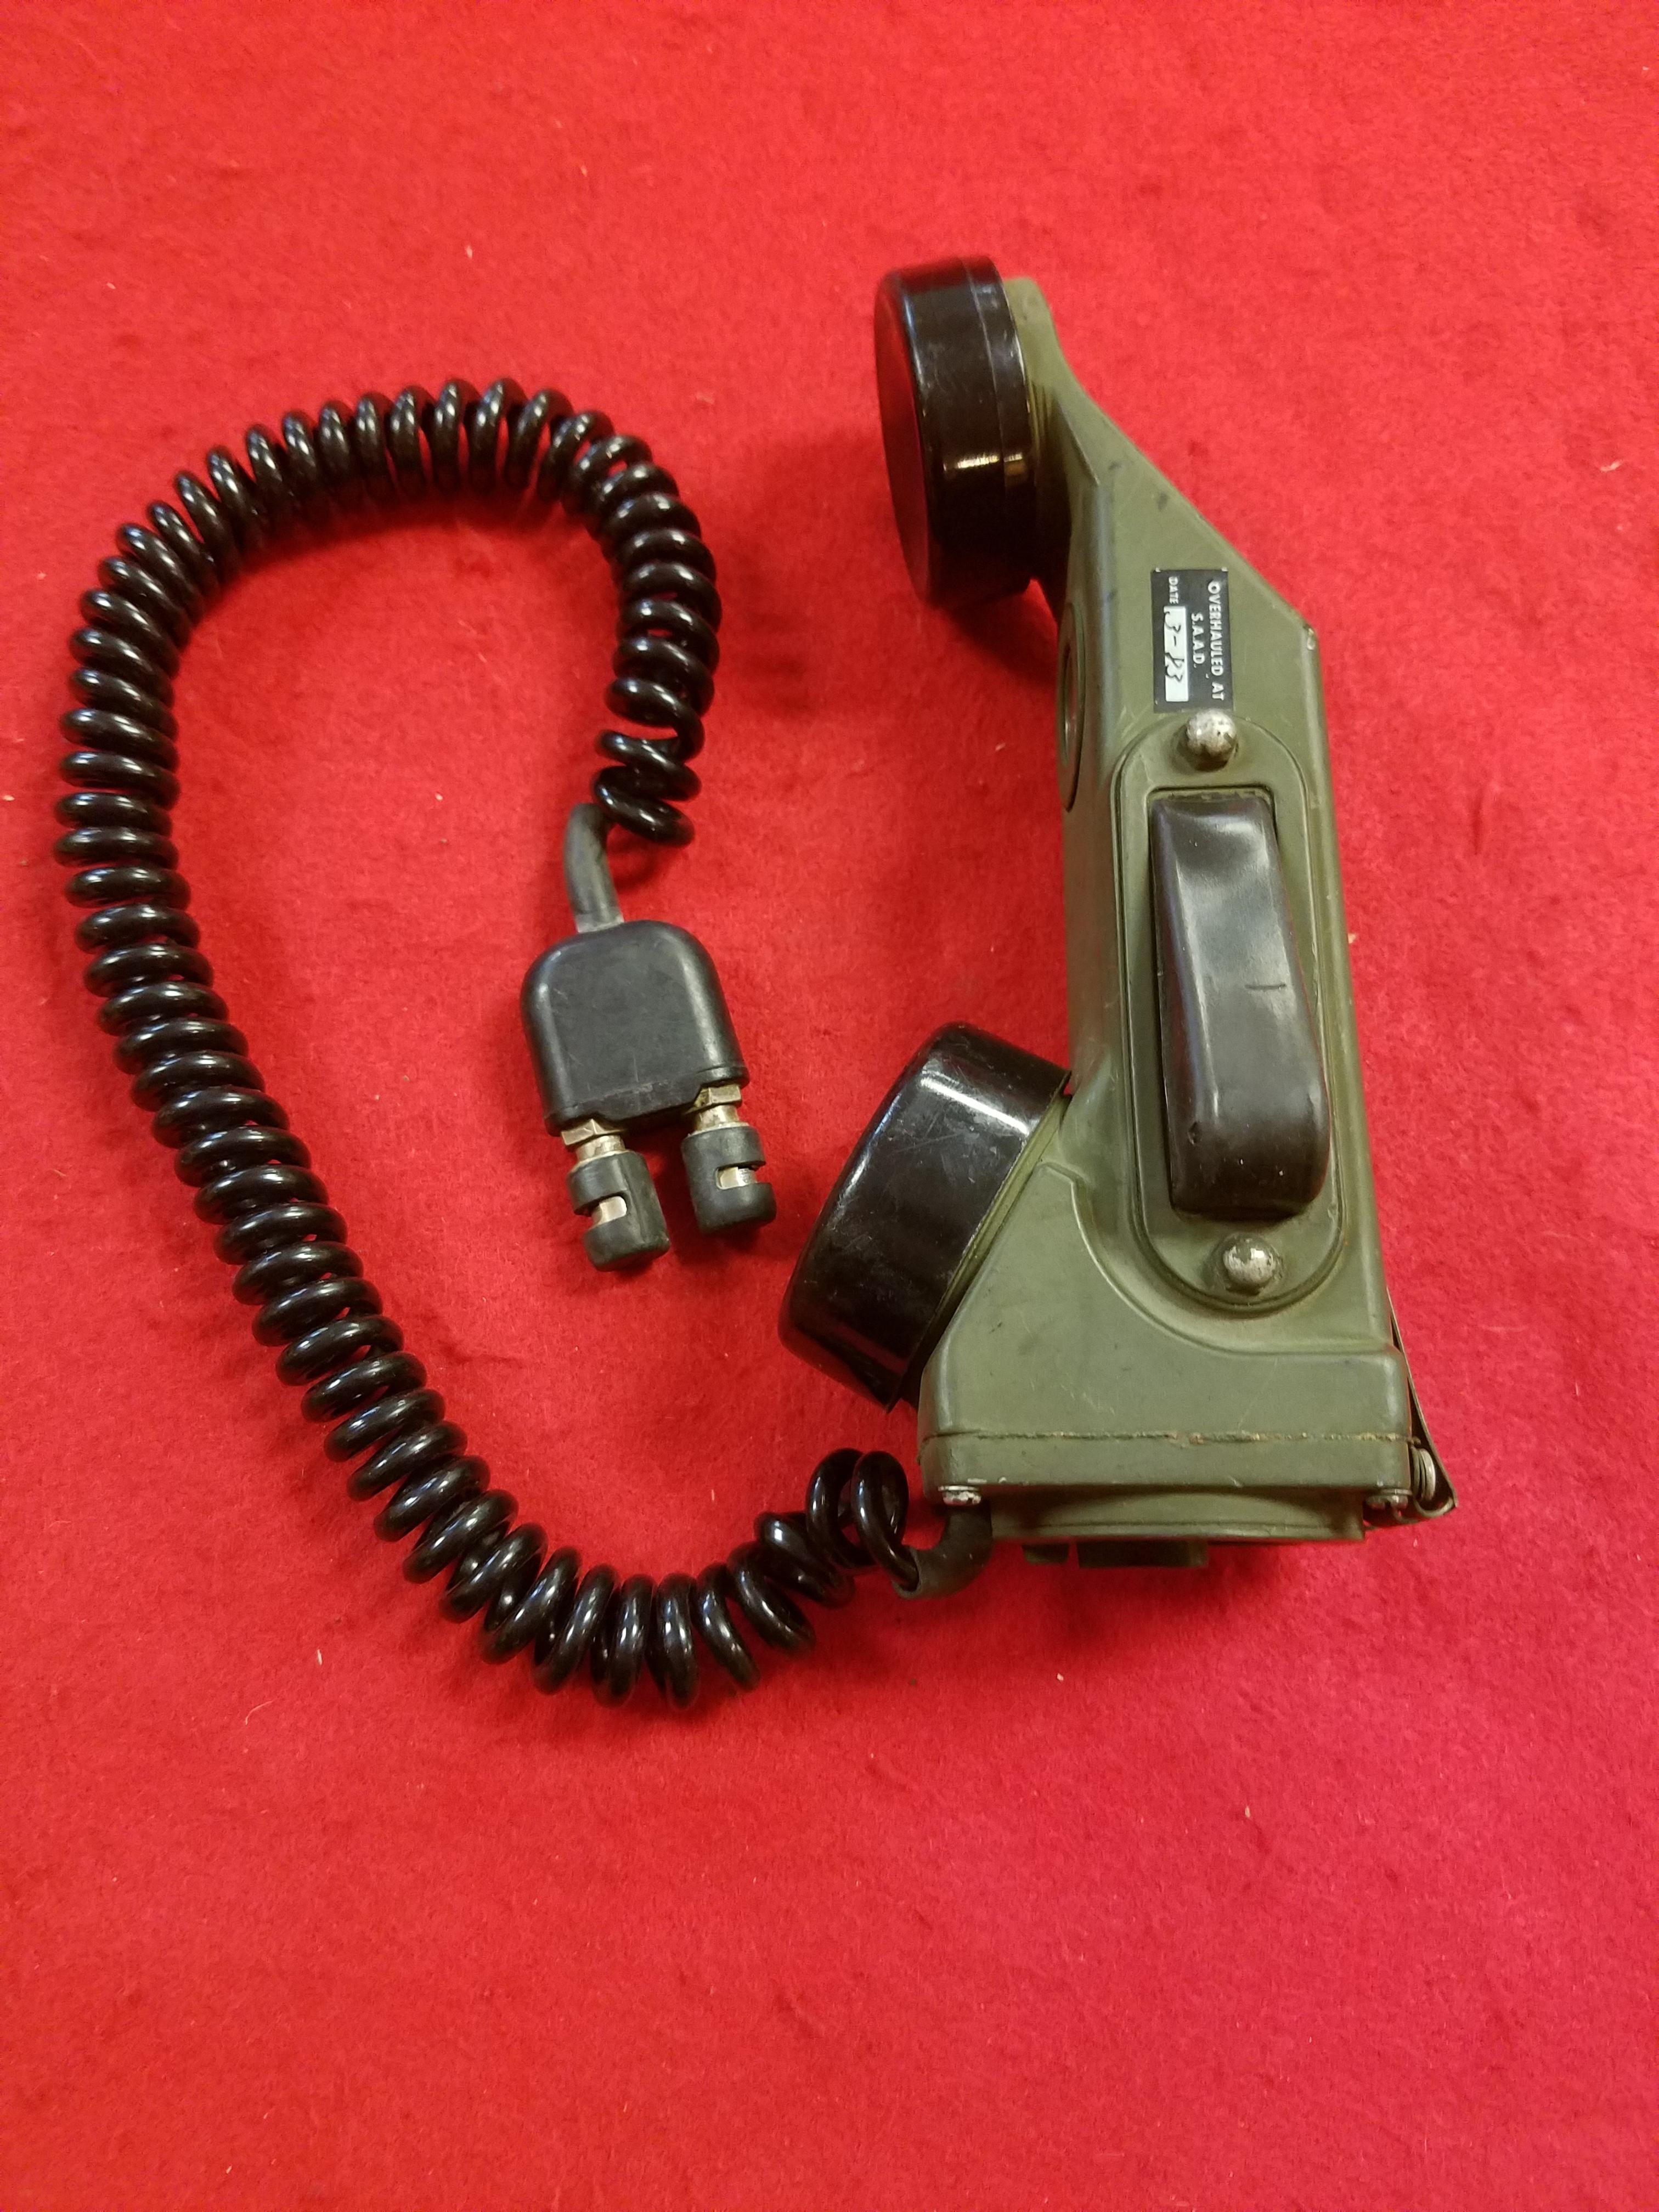 VINTAGE U.S. MILITARY TELEPHONE SET -TA-1/PT S/N: 3791 IN BLACK HARD CASE